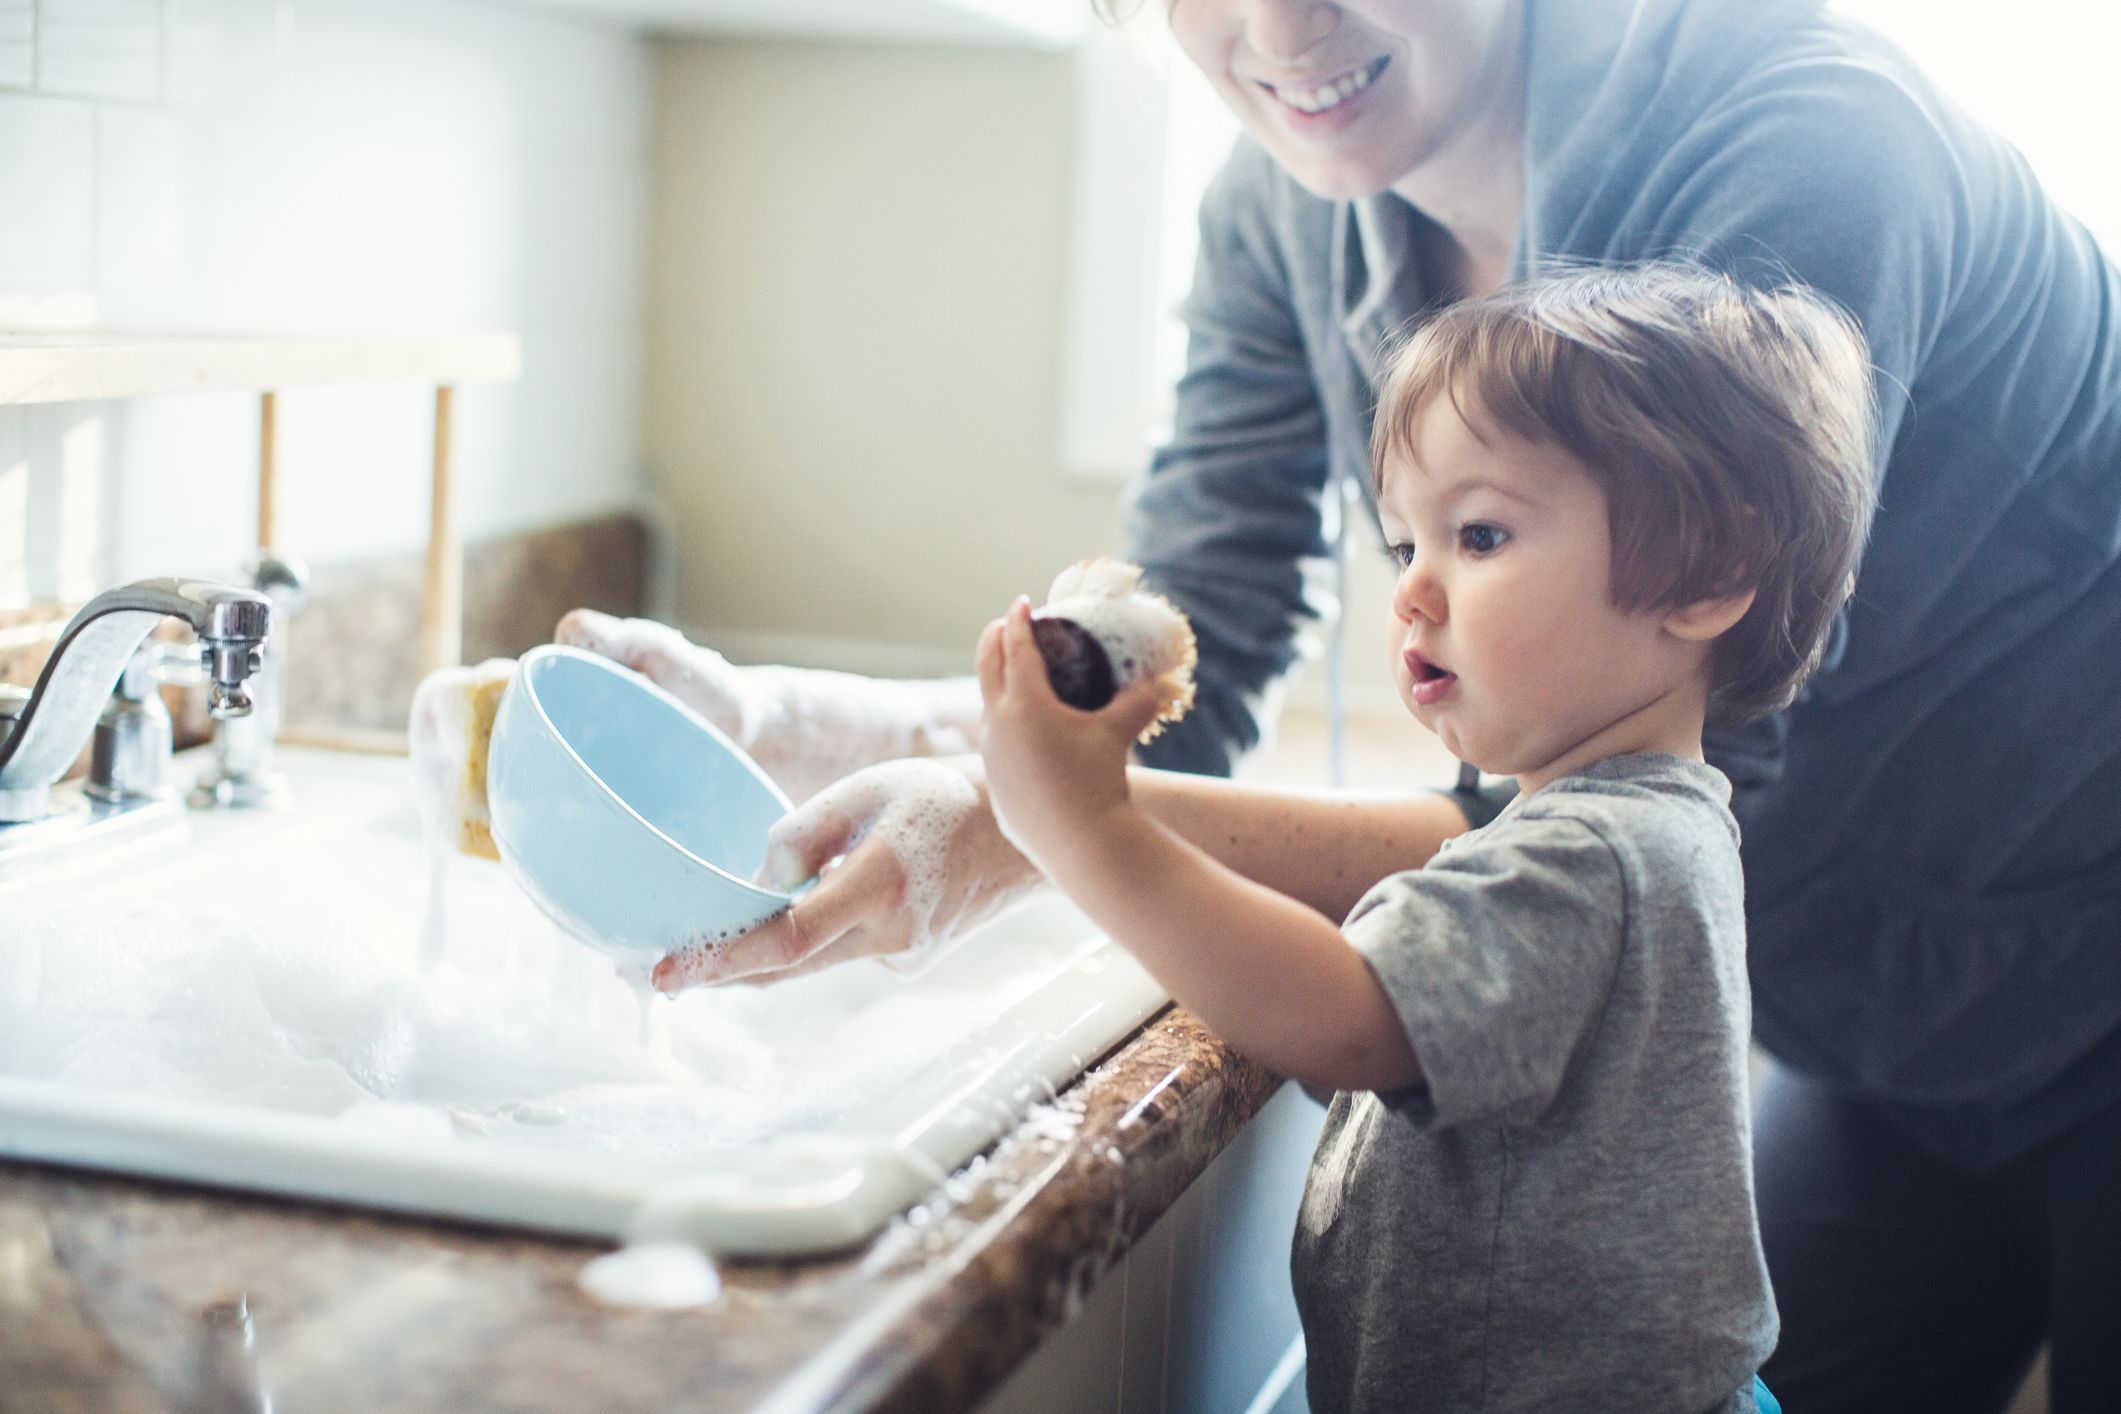 Baby-Dish-Washing-159317010_2122x1415-compressor-1